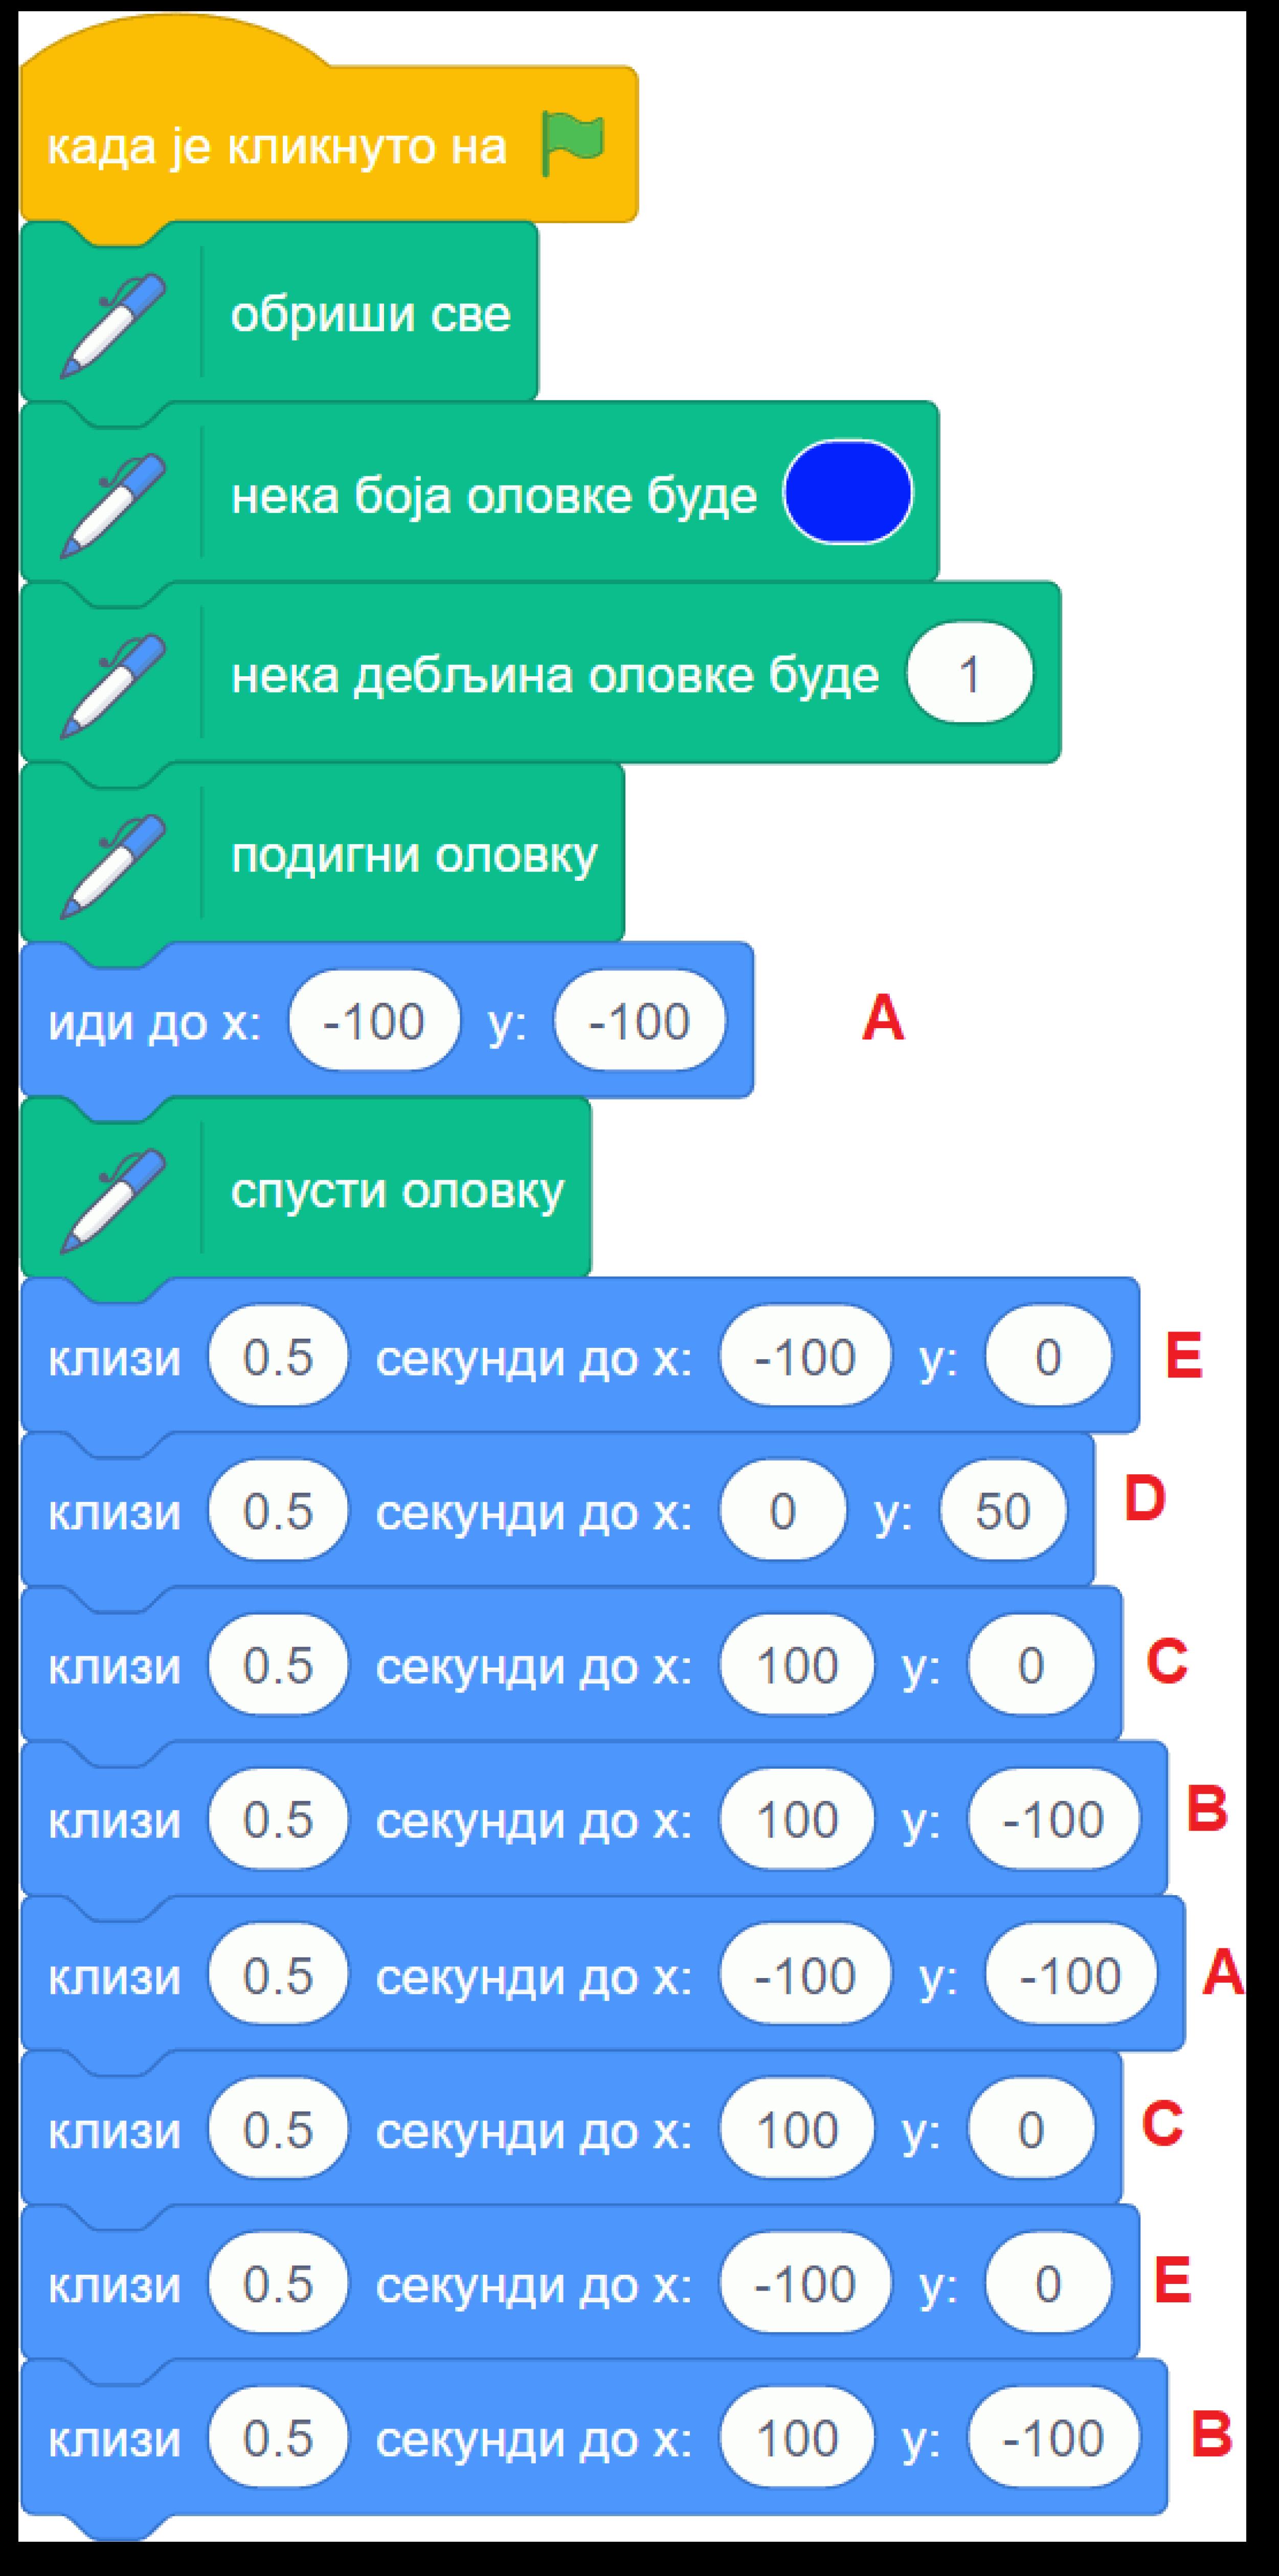 https://petljamediastorage.blob.core.windows.net/root/Media/Default/Kursevi/OnlineNastava/kurs-racunarstvo-peti/koverta_skripta.png